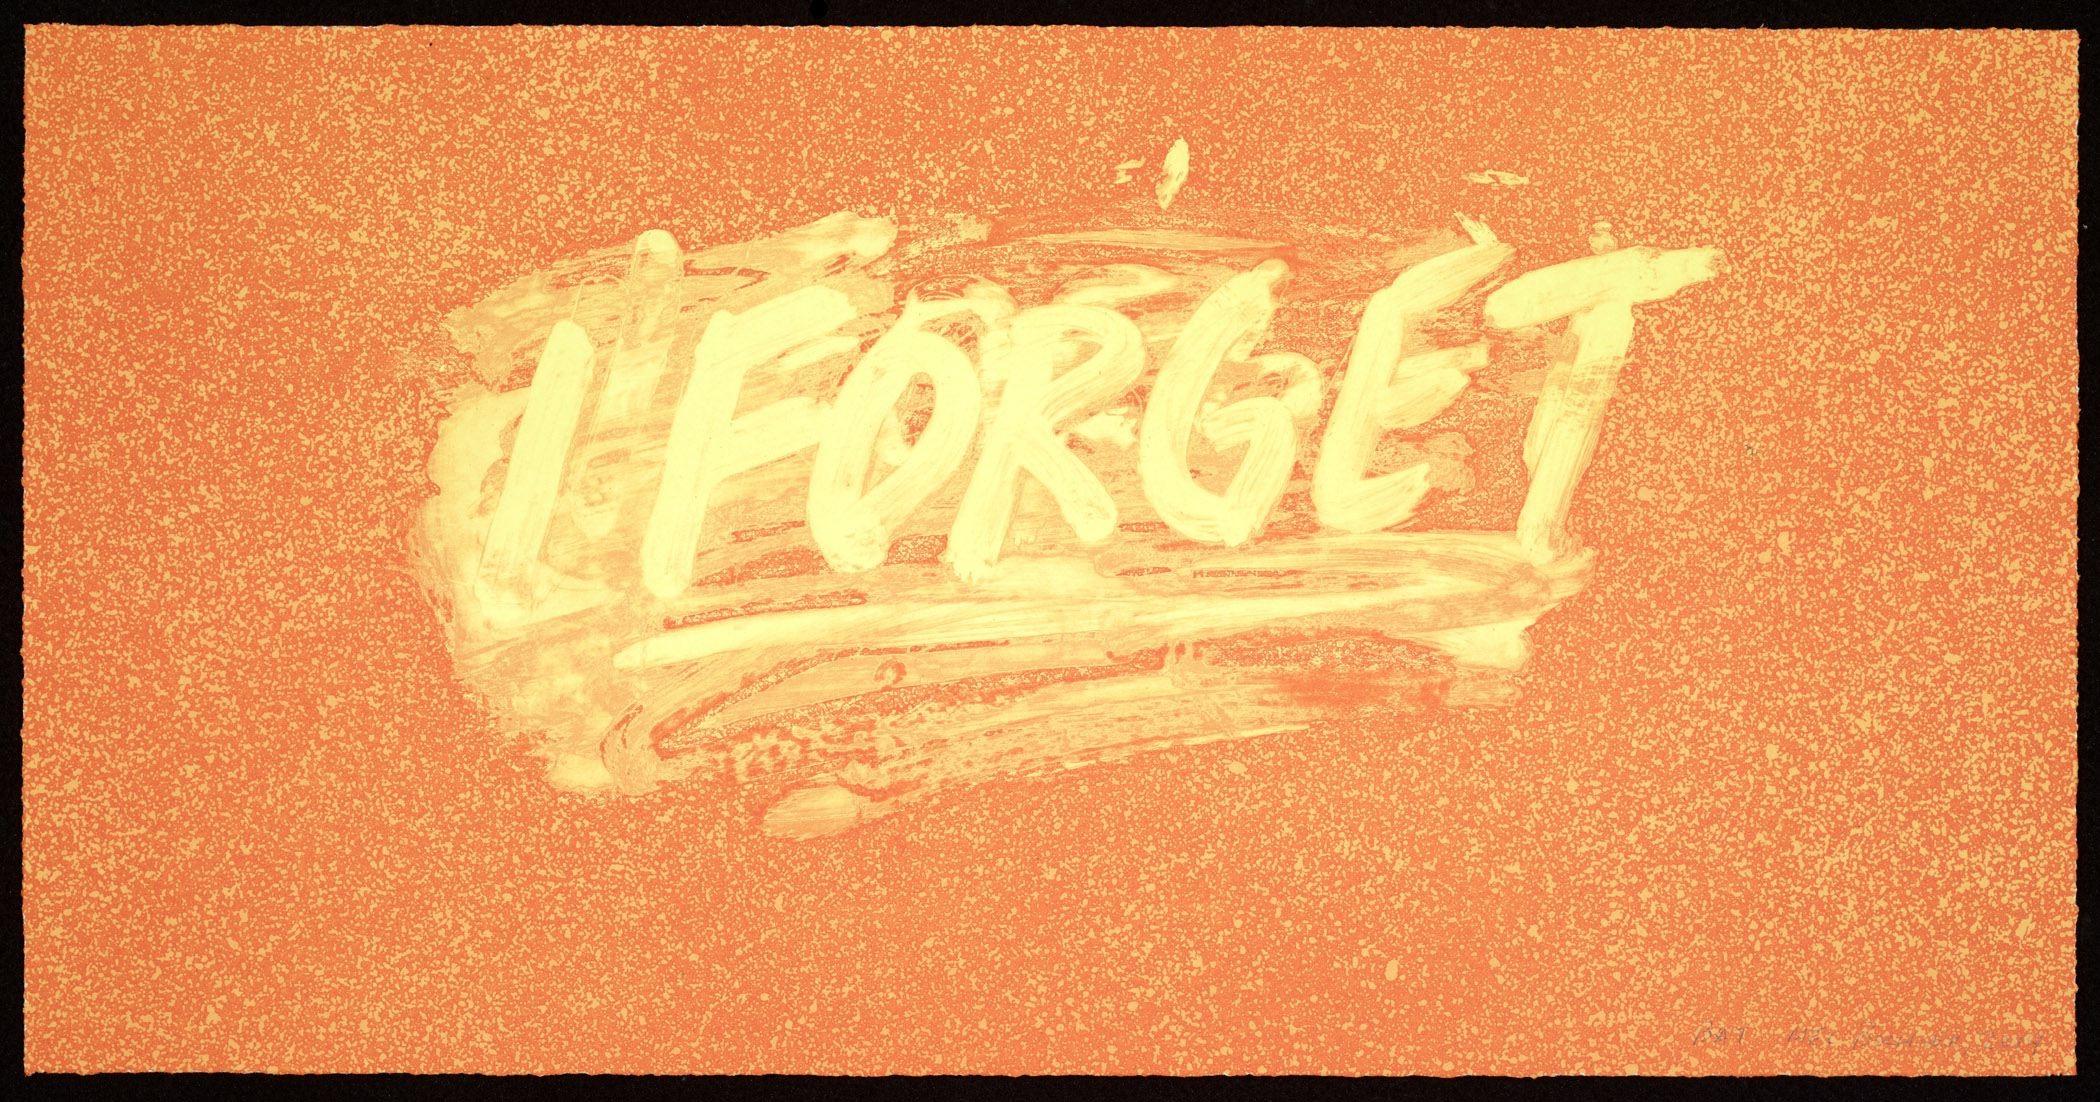 I forget (orange) by Mel Bochner